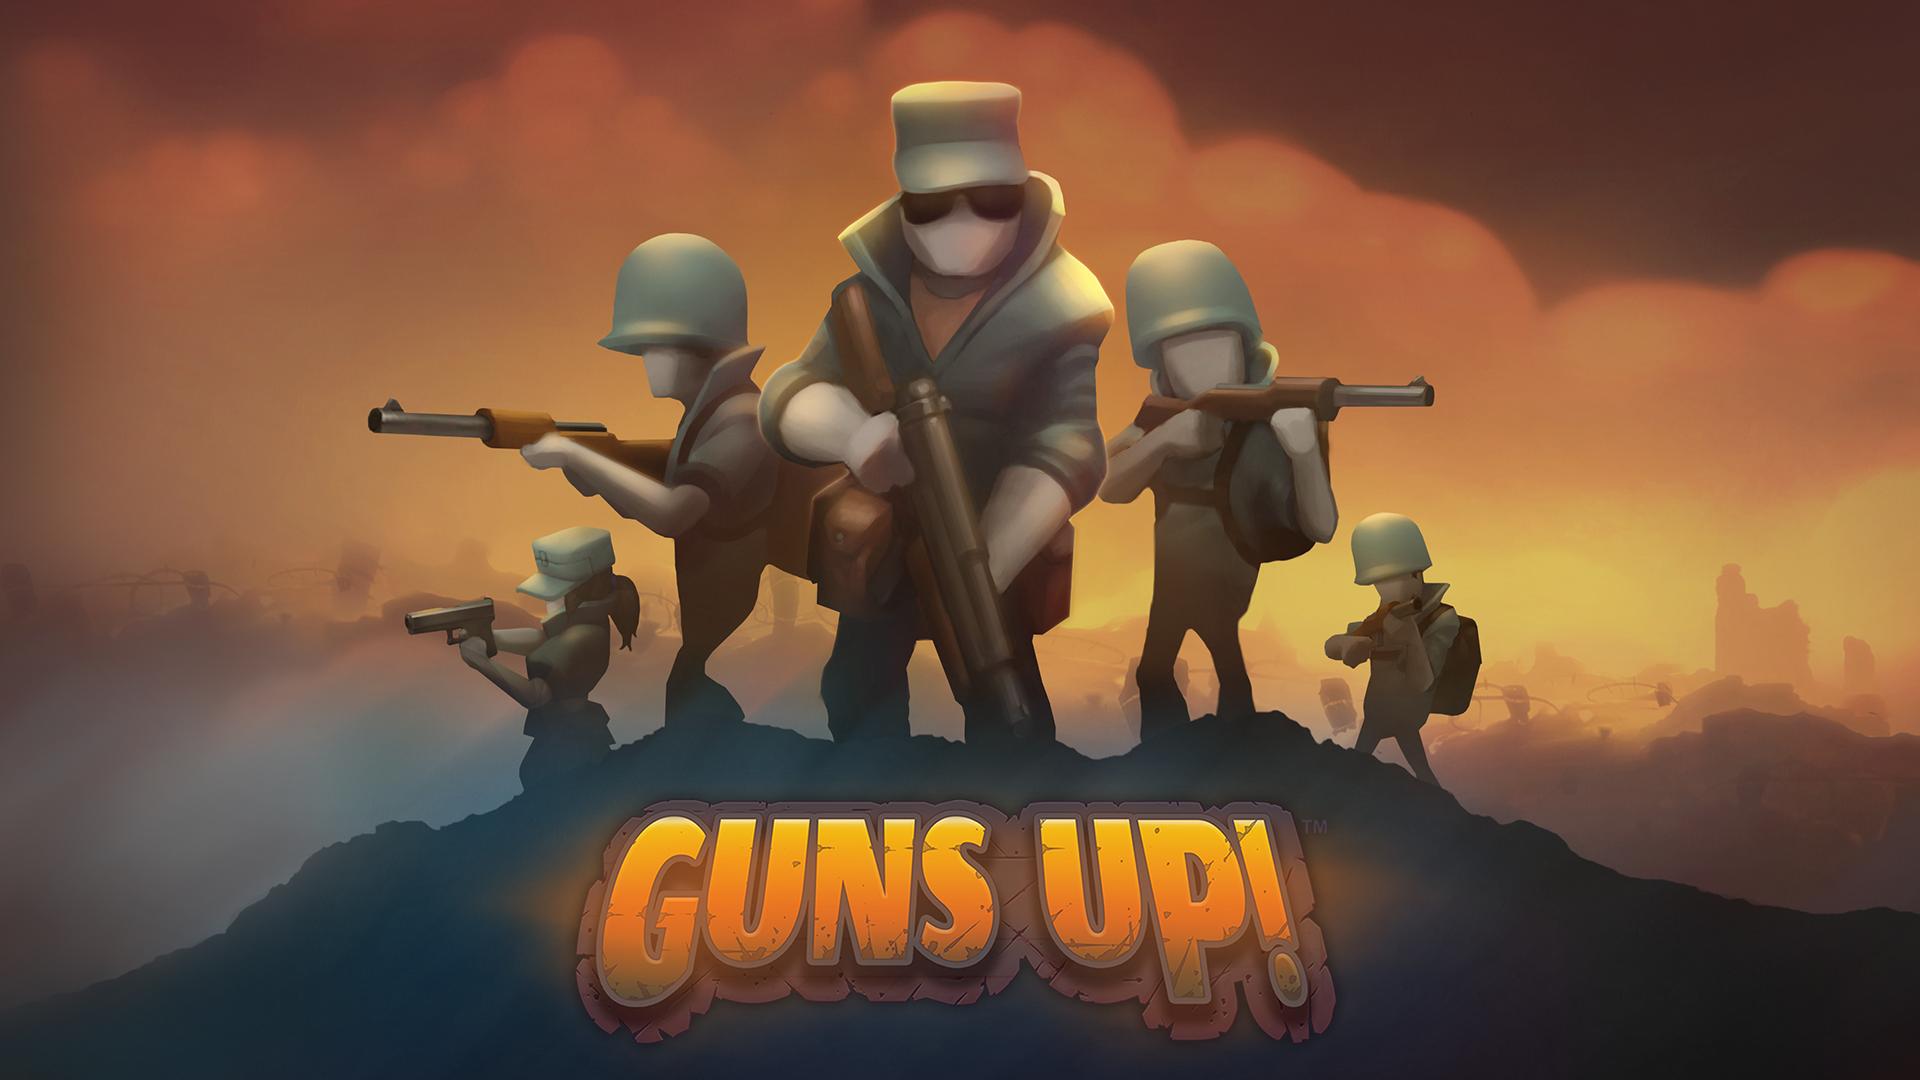 GunsUp_Anniversary_1920.png